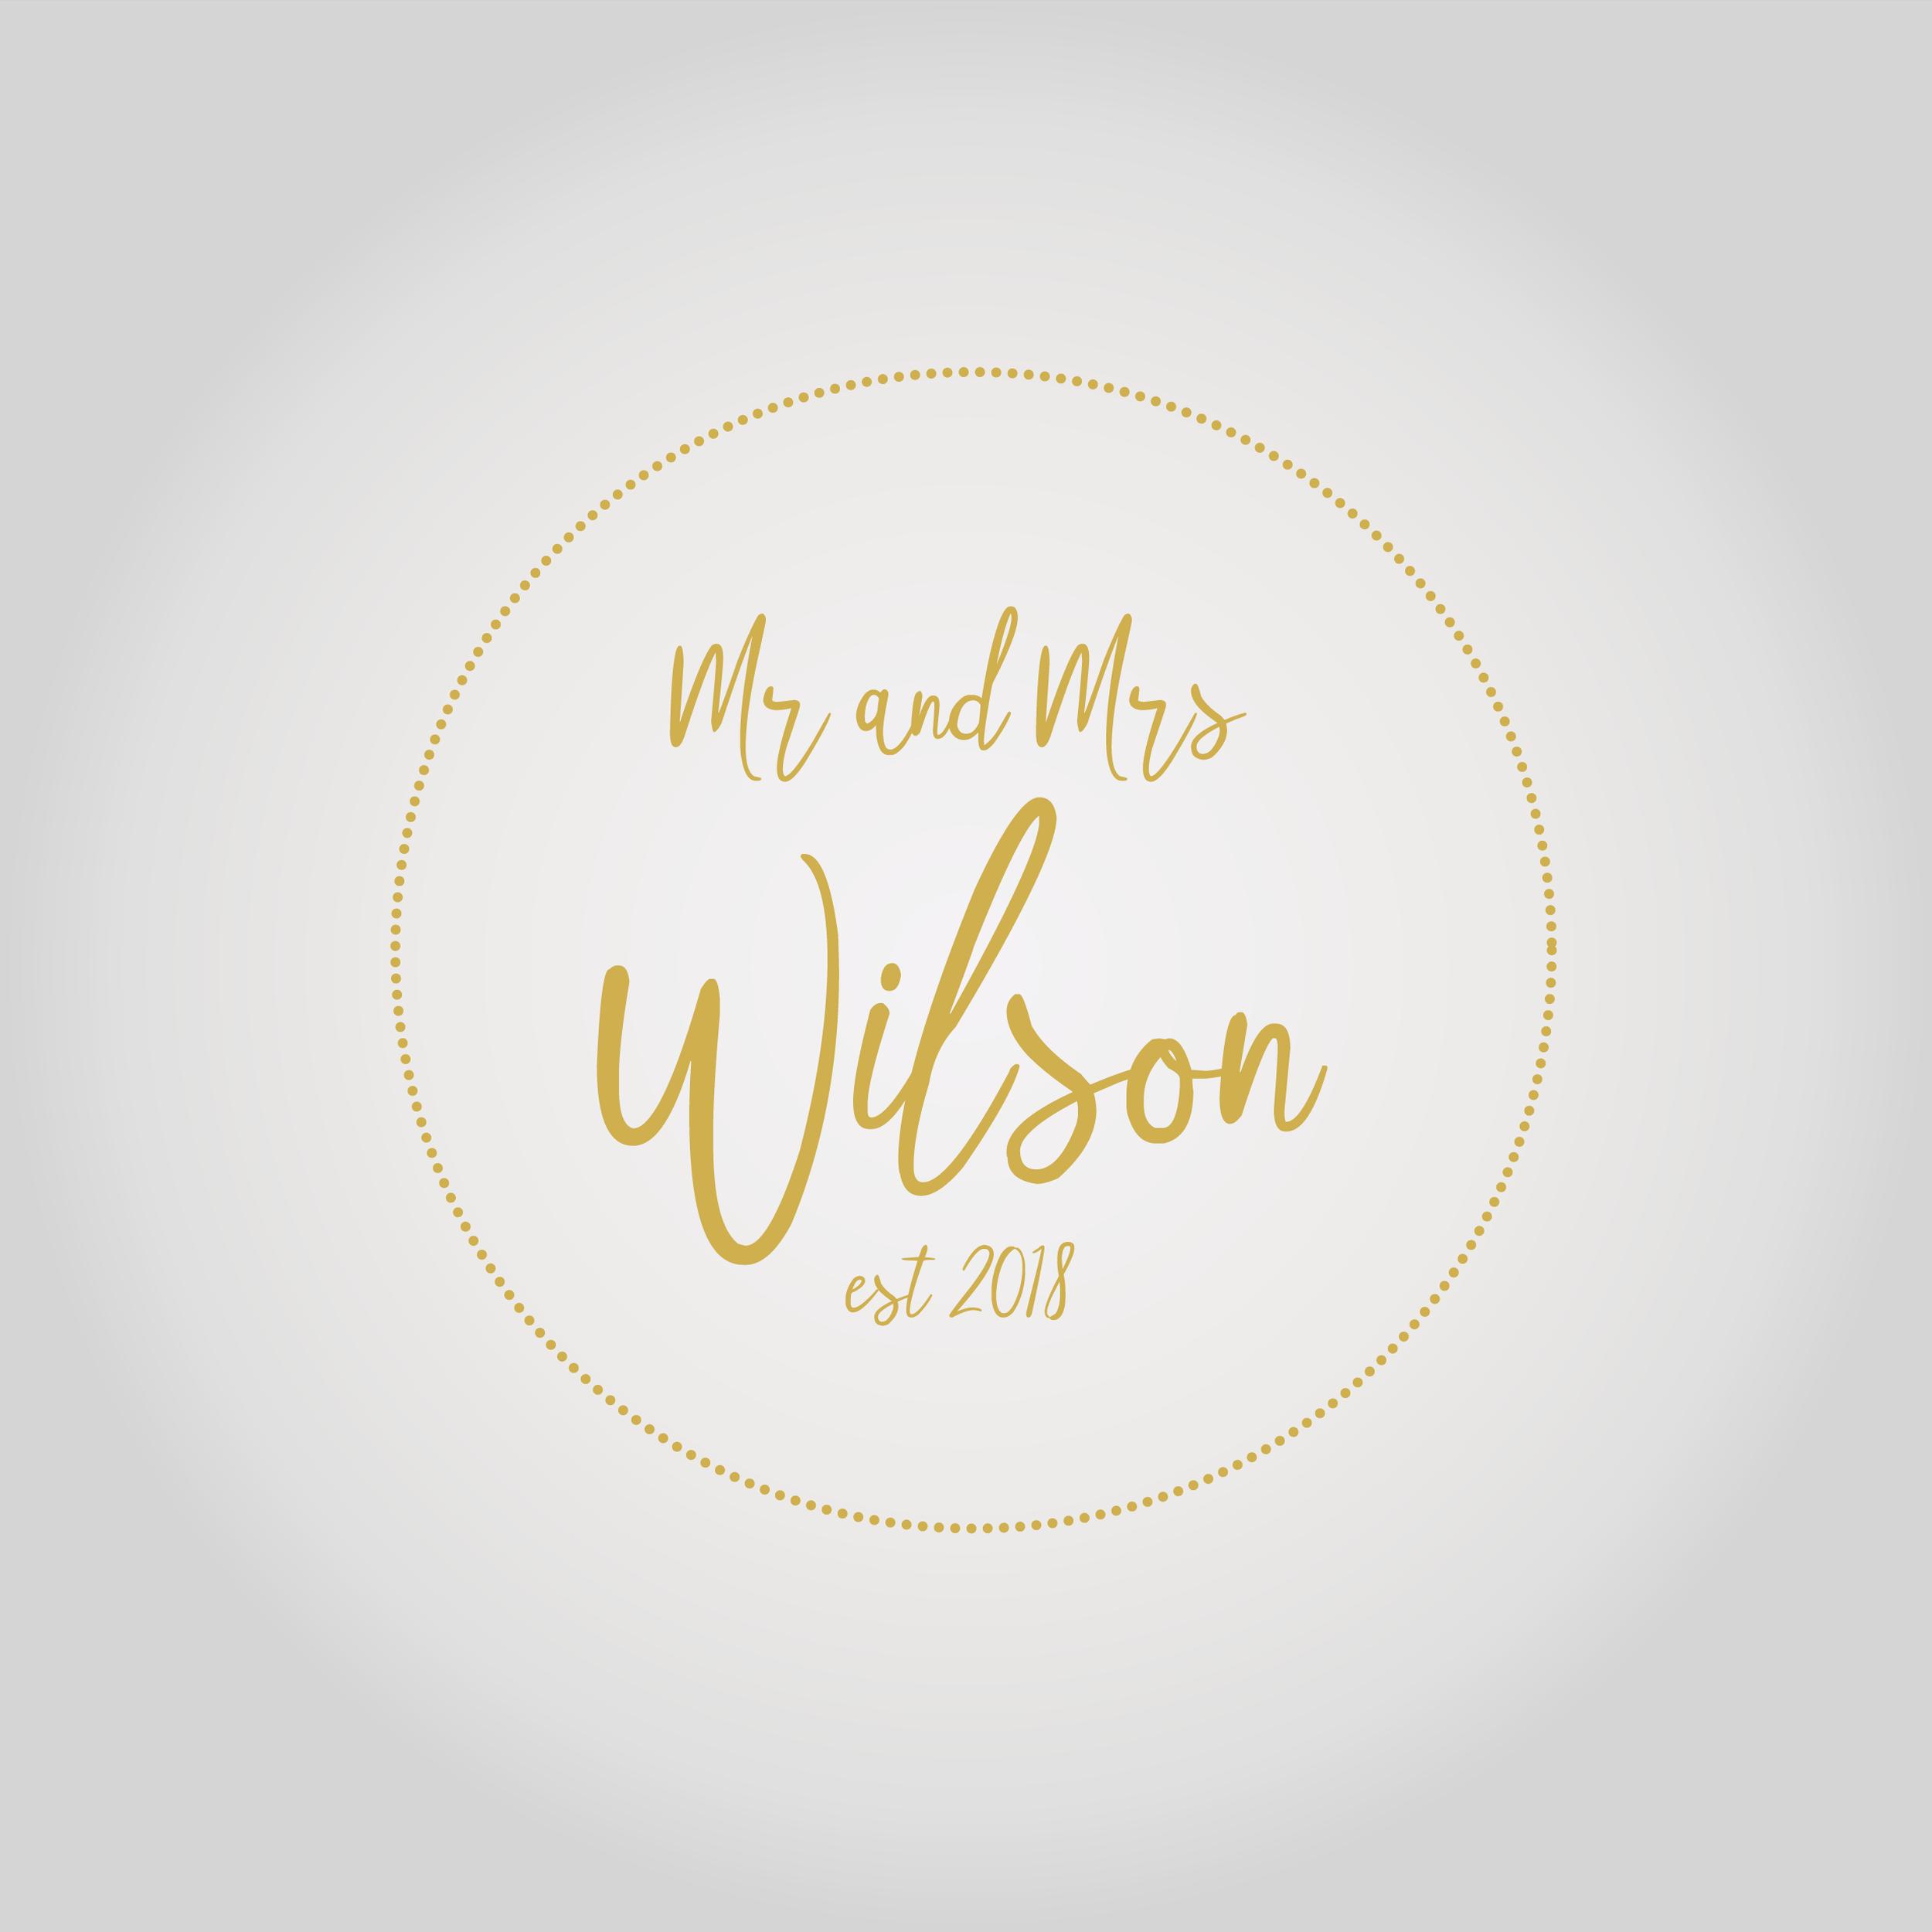 Wedding Invitation | Graphic Design | Pinterest | Ads